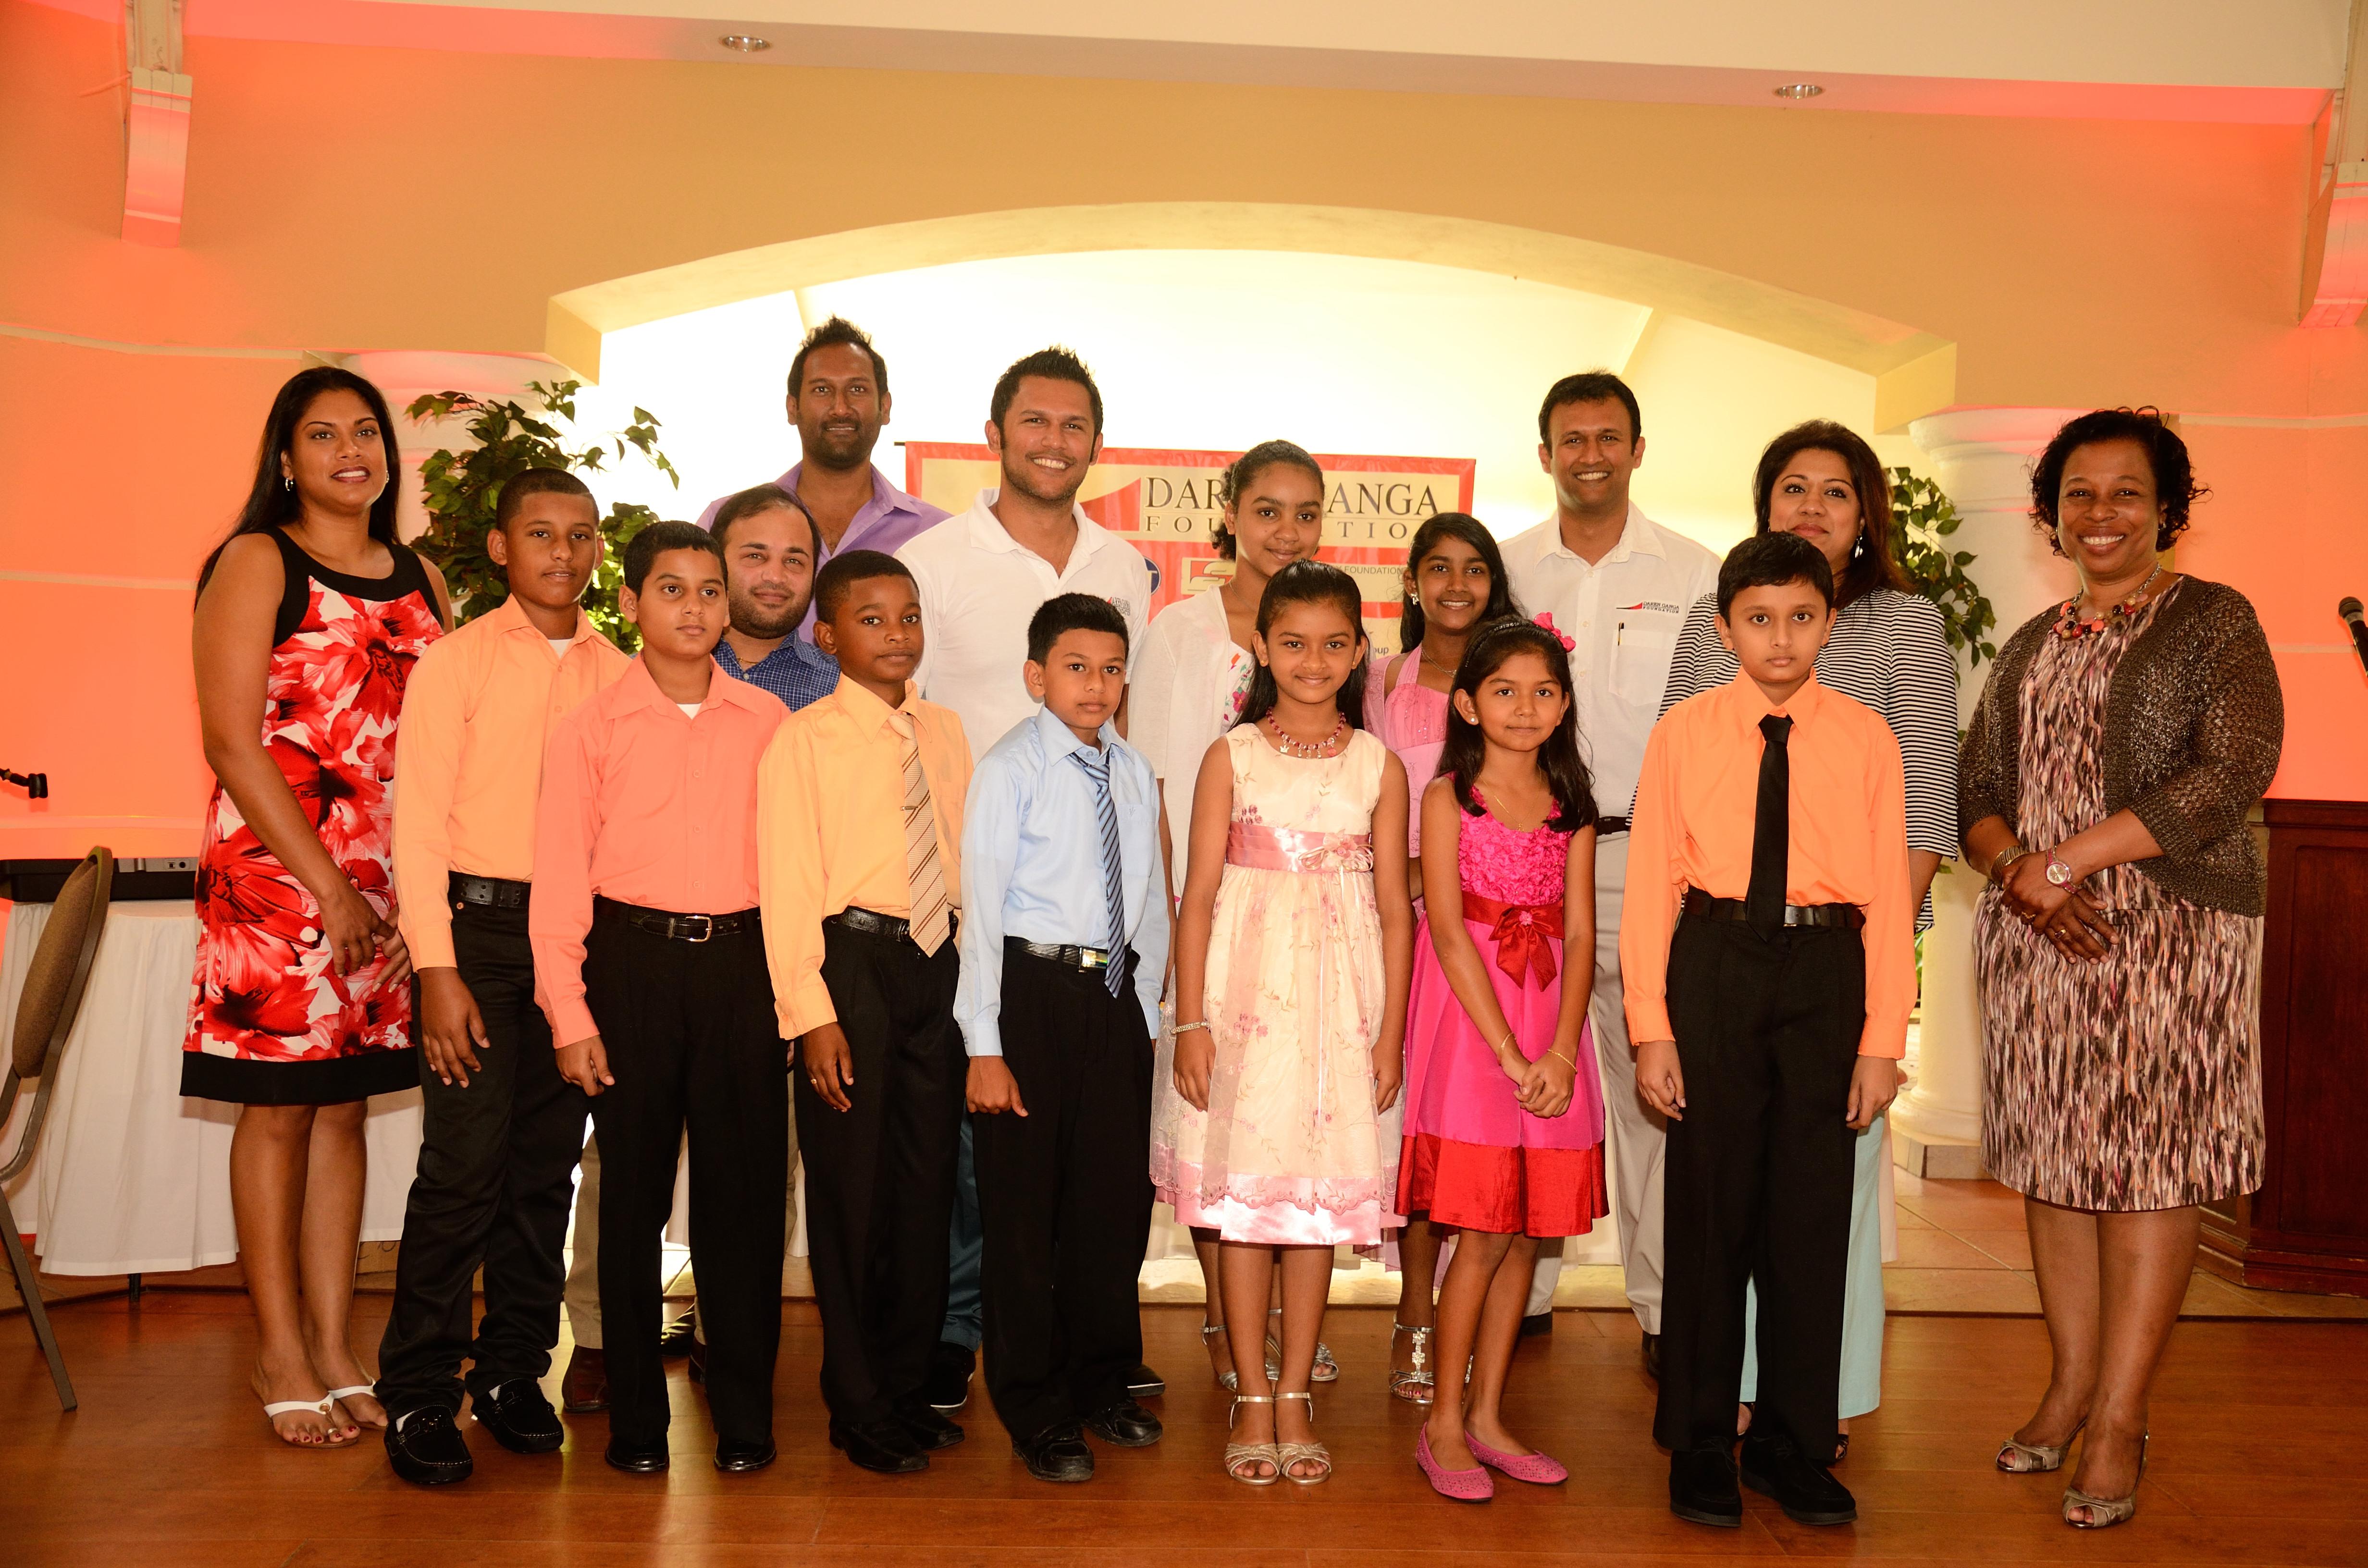 The Daren Ganga Foundation Graduation 2014